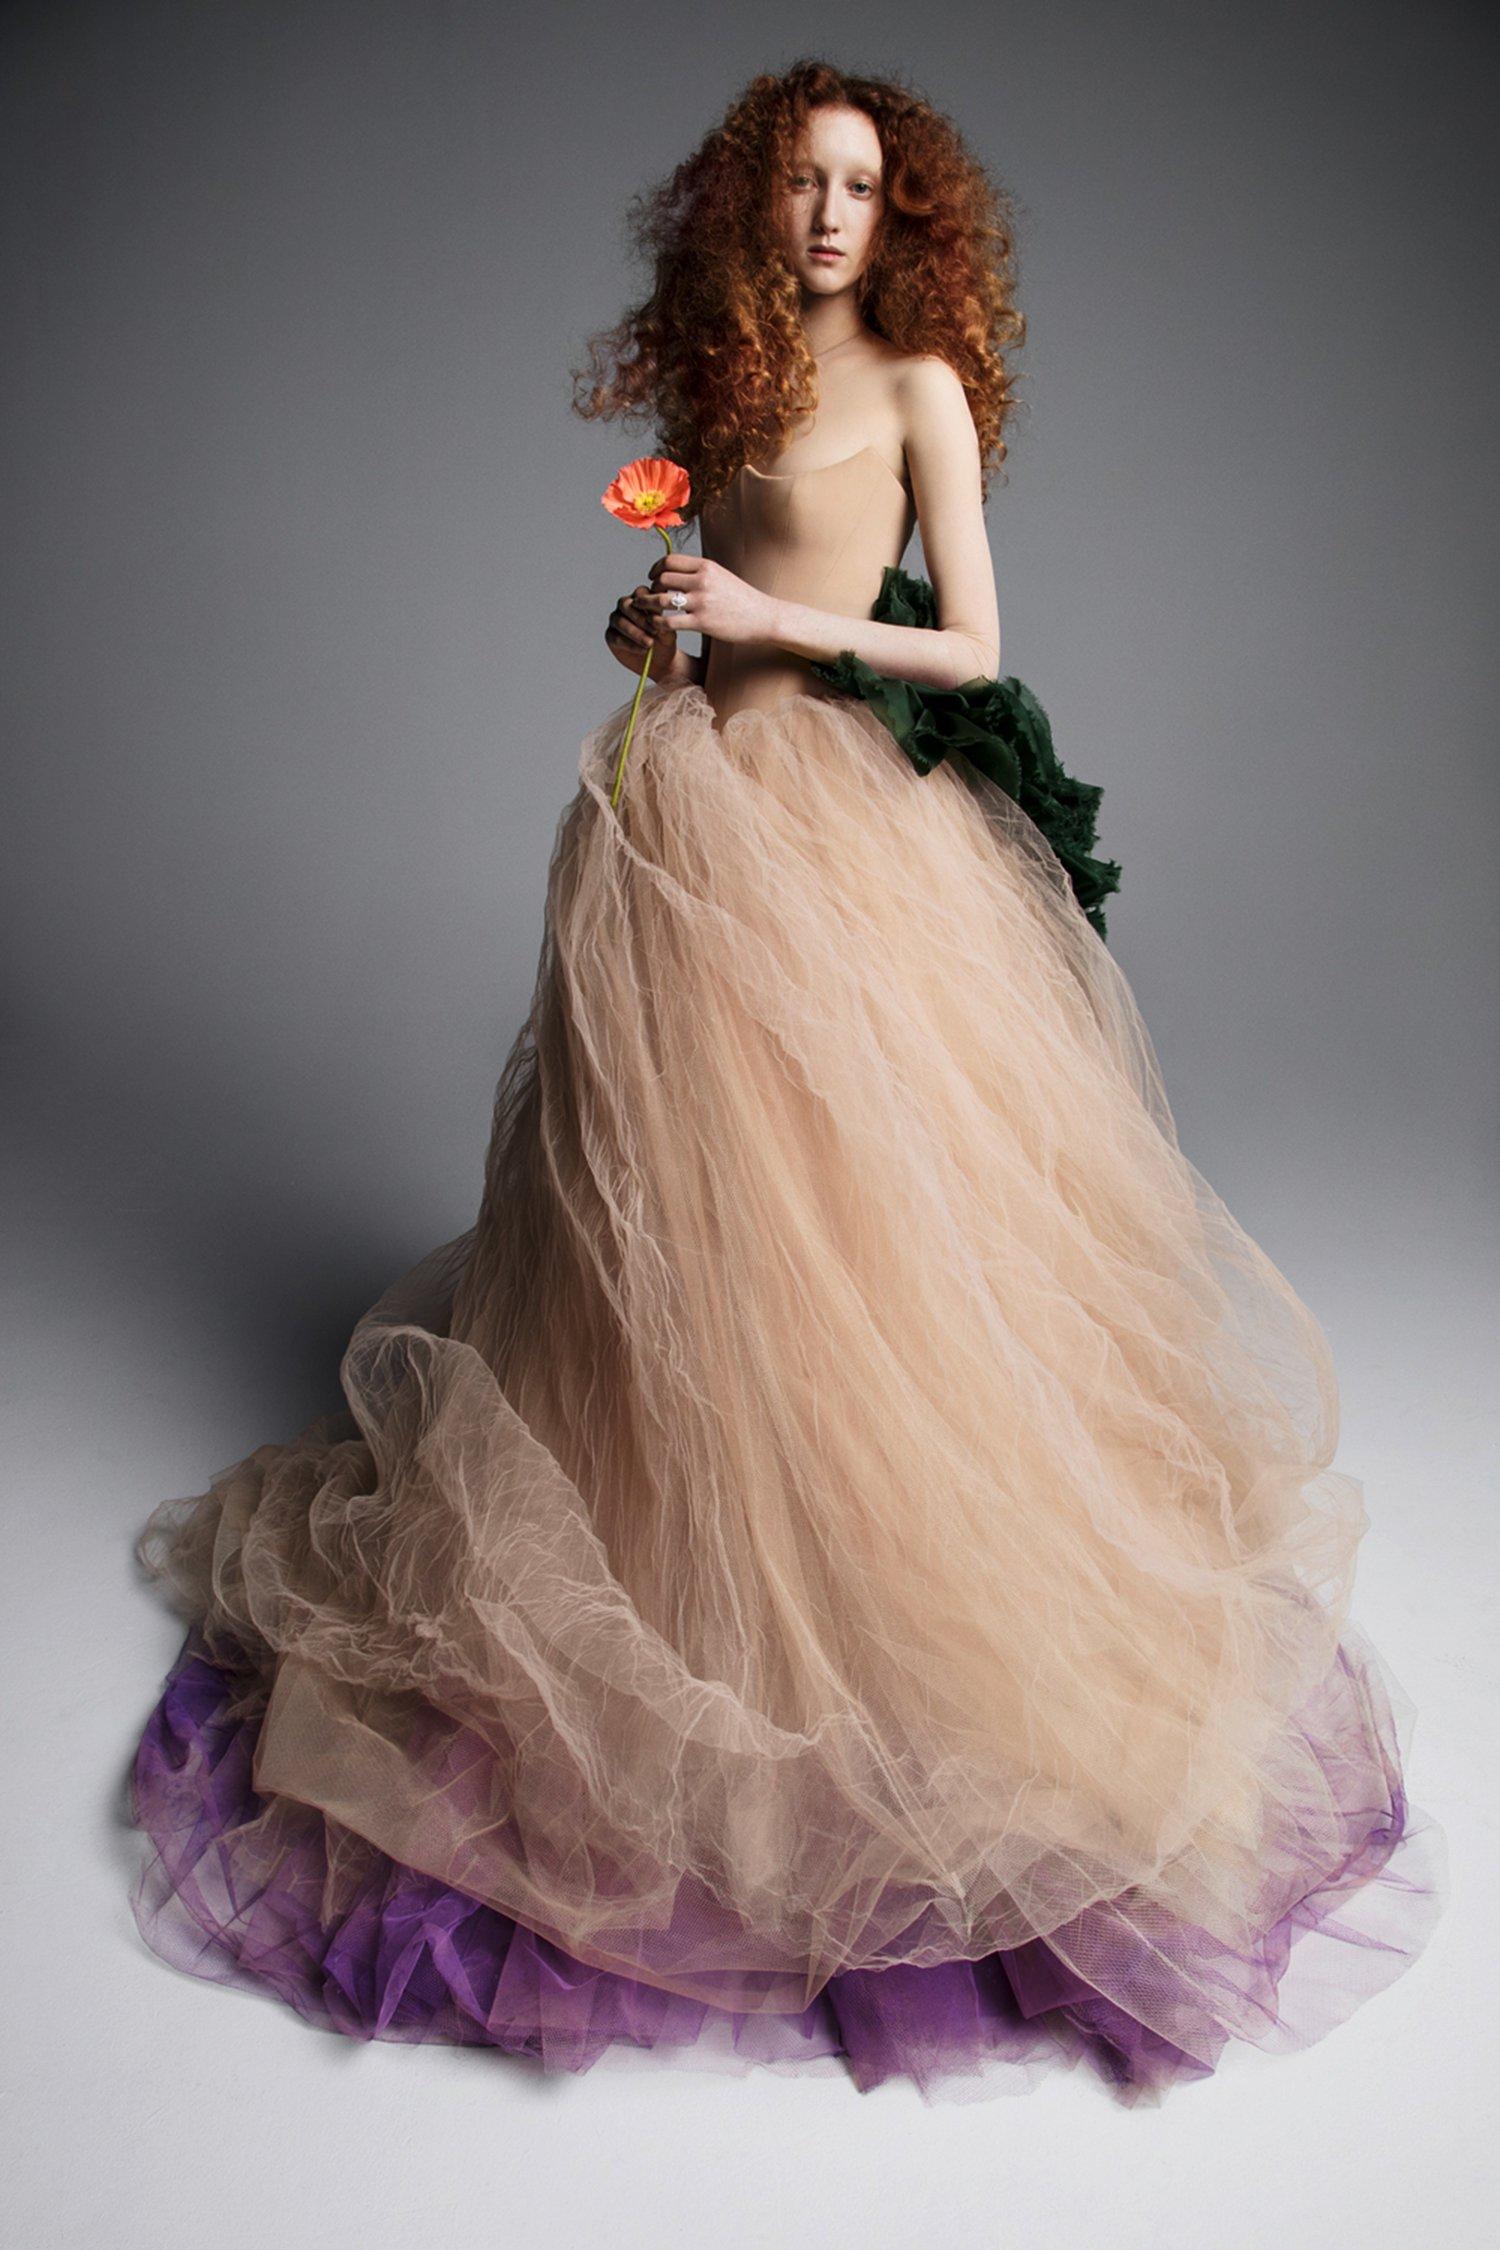 Vera Wang Spring 2019 Bridal Collection Inspiration And Advice